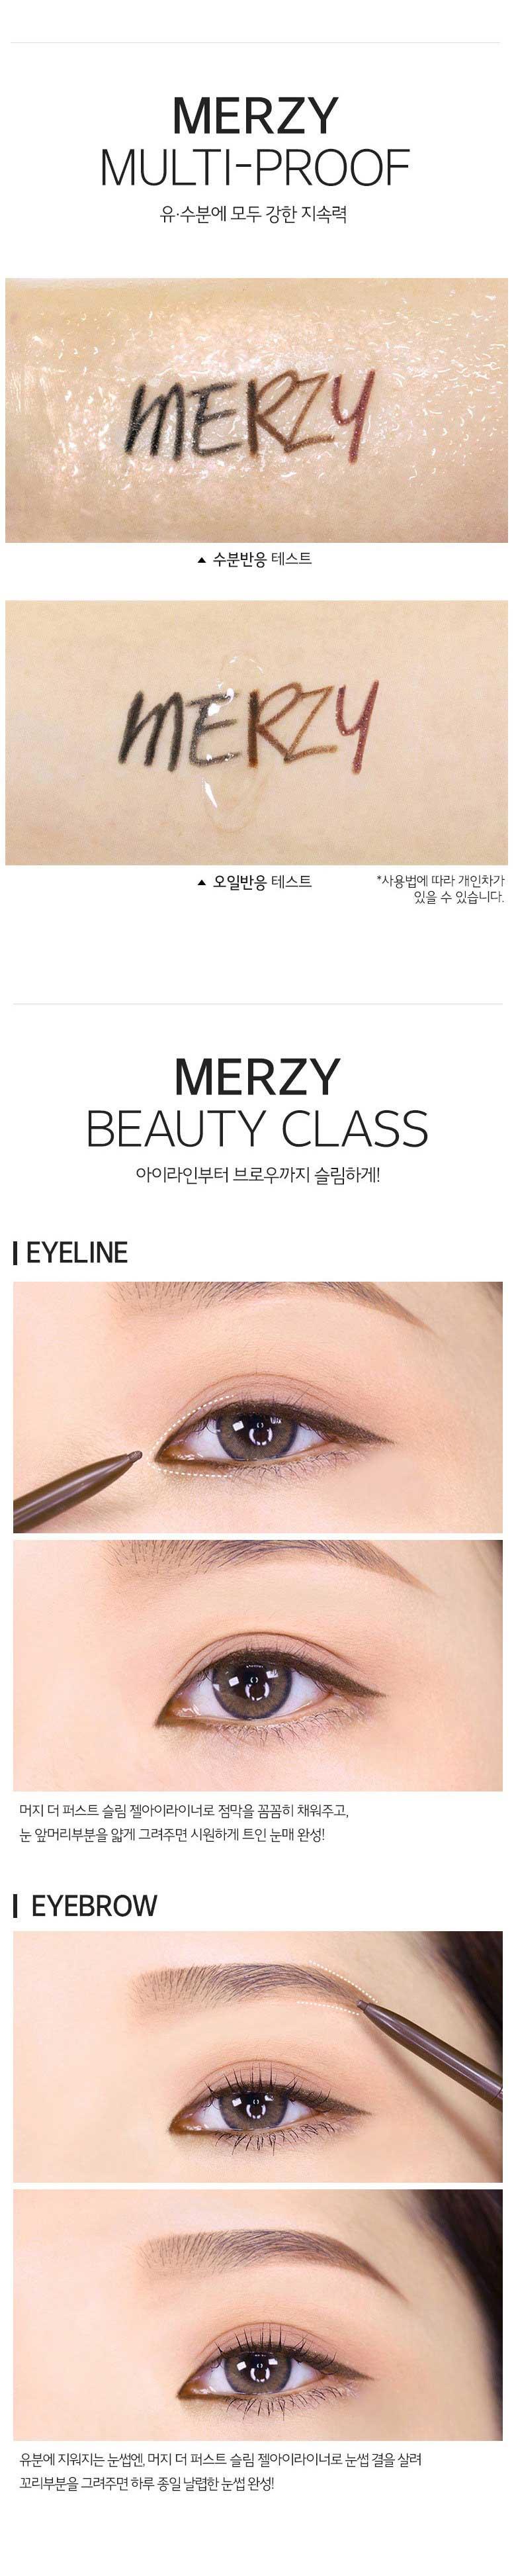 -merzy-the-first-slim-gel-eyeliner4.jpg